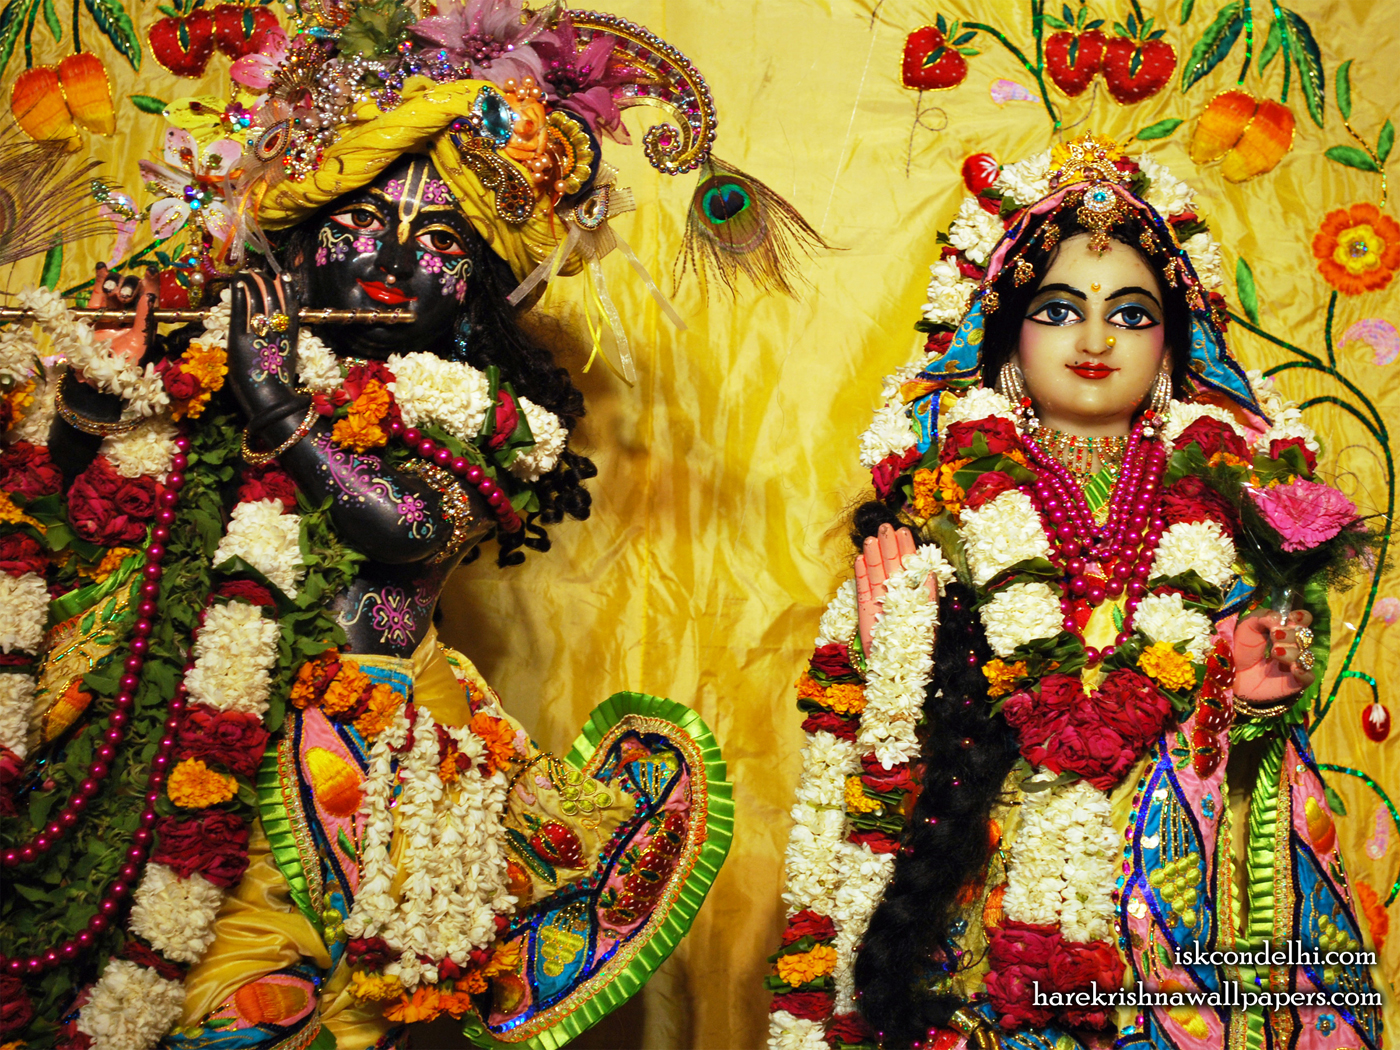 Sri Sri Radha Parthasarathi Close up Wallpaper (011) Size 1400x1050 Download